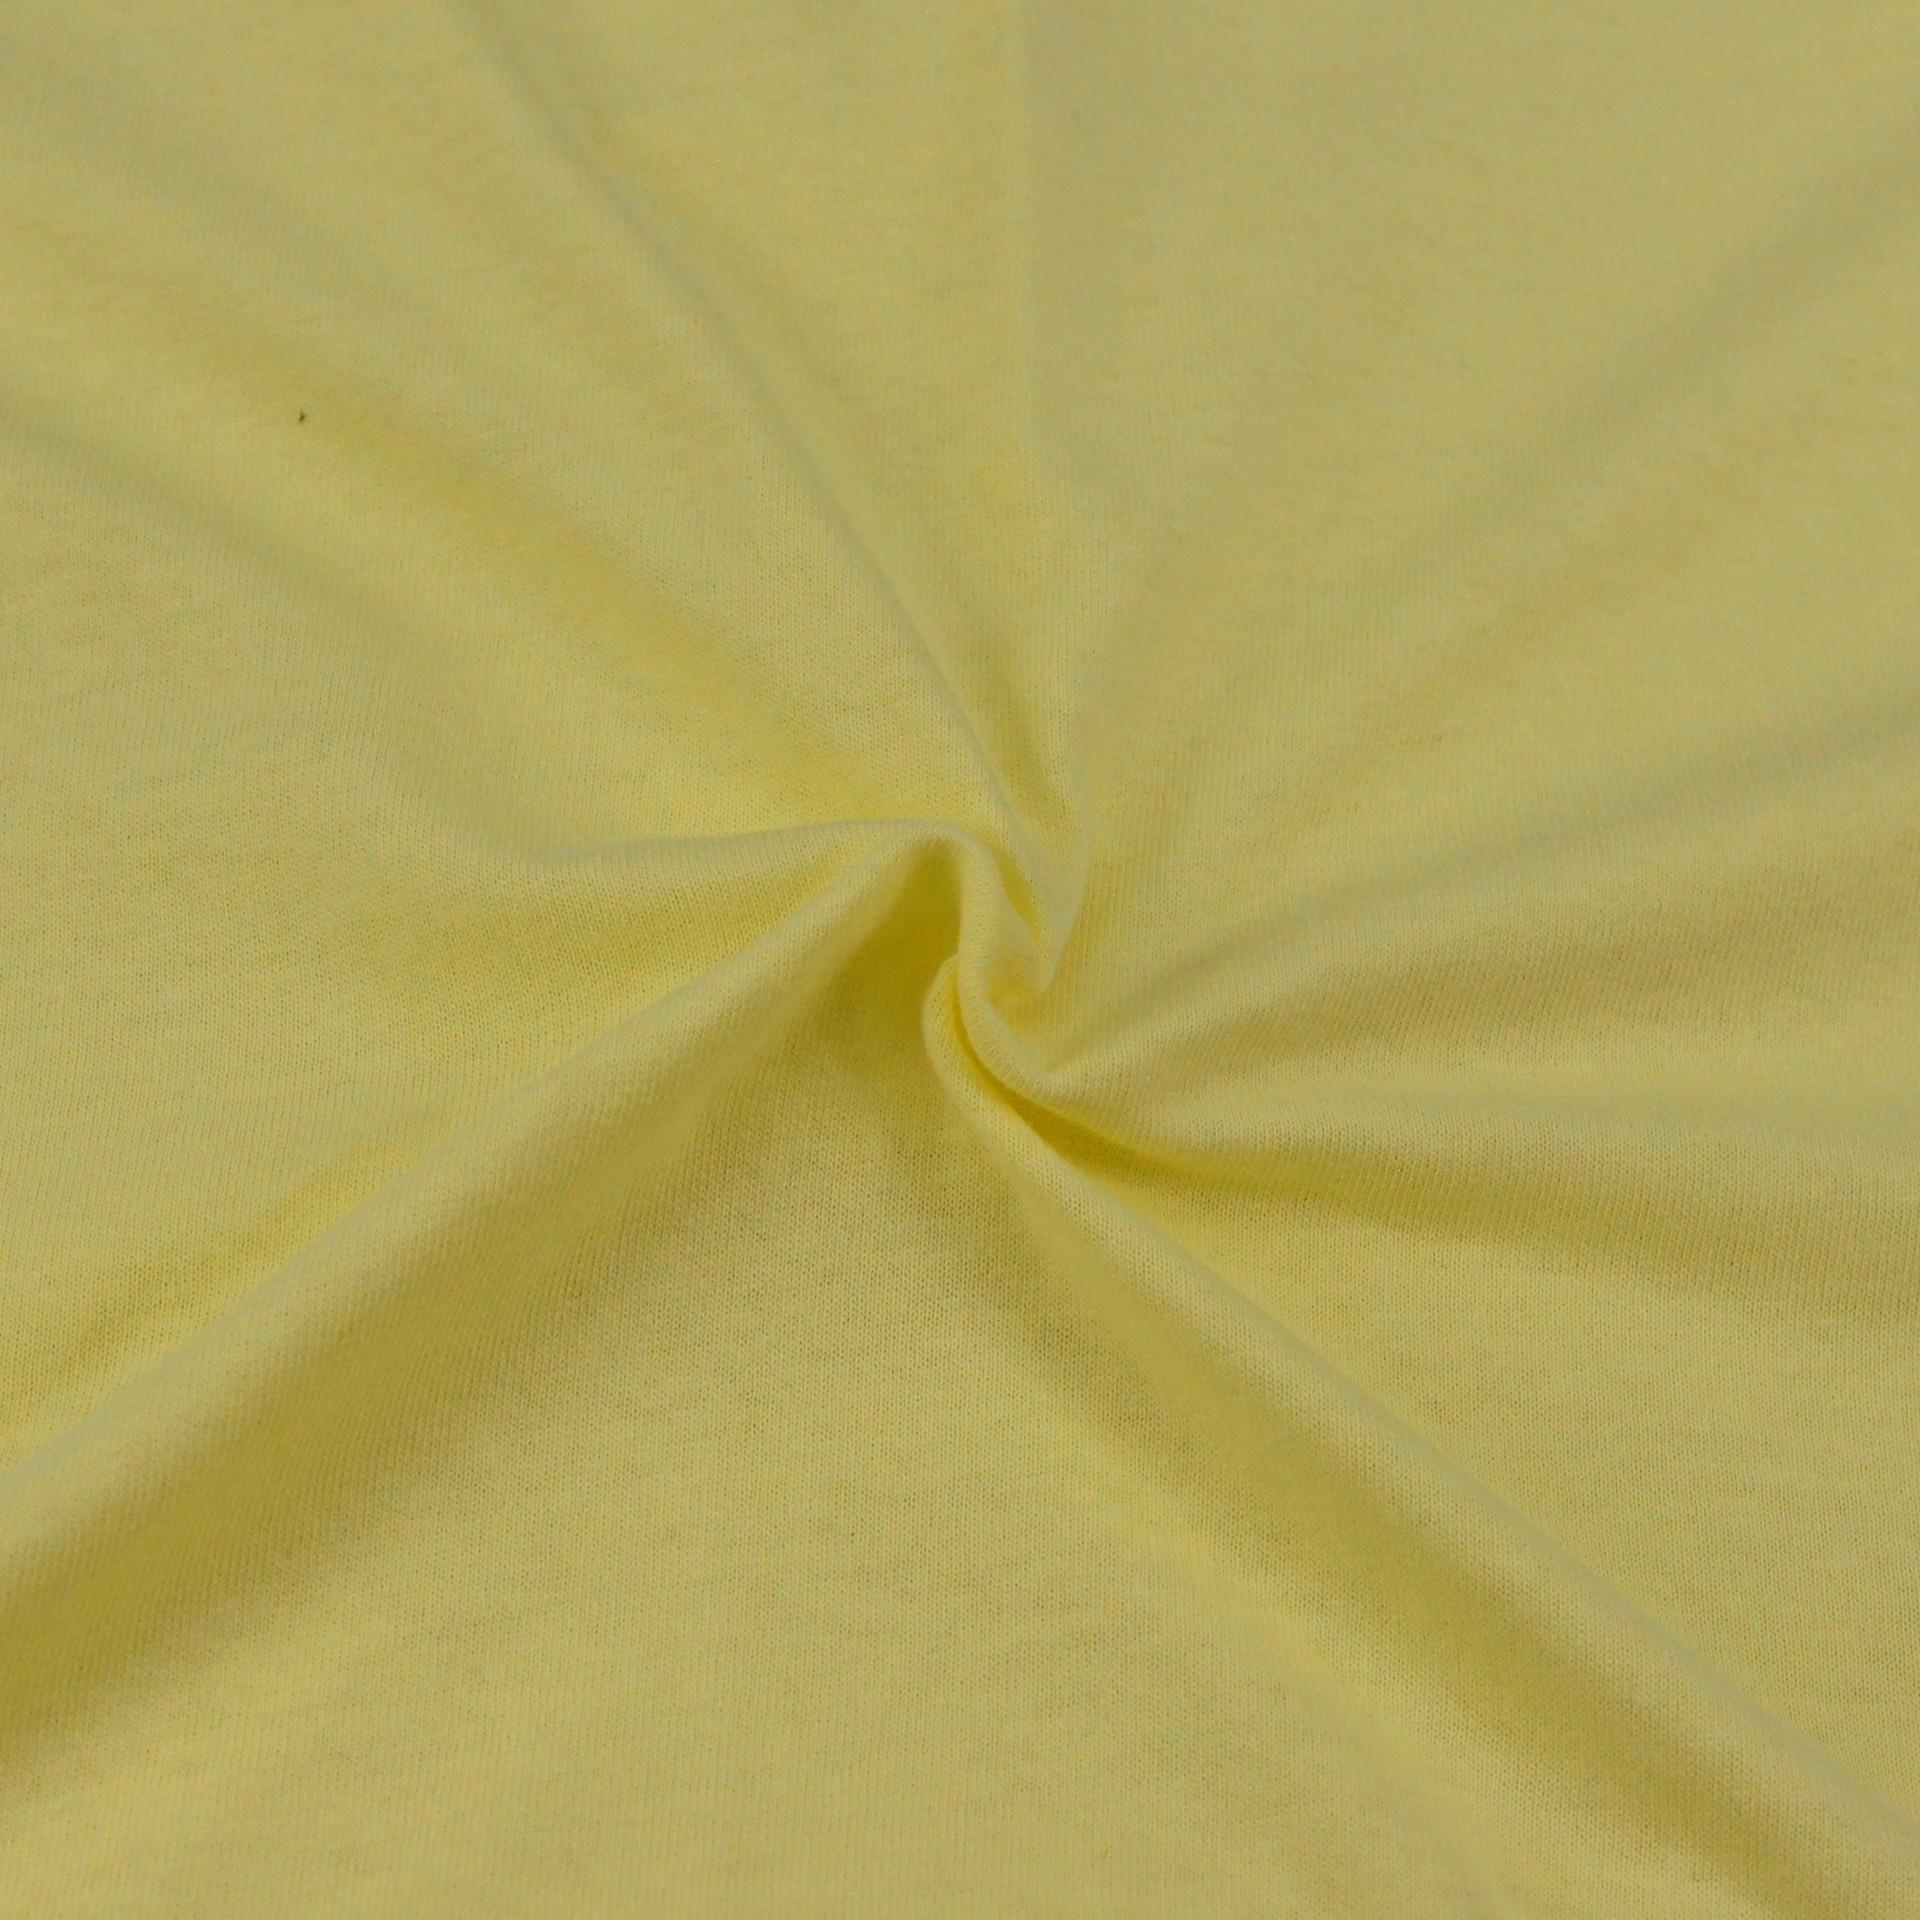 Jersey prostěradlo citrus, Výběr rozměru - 90x200cm